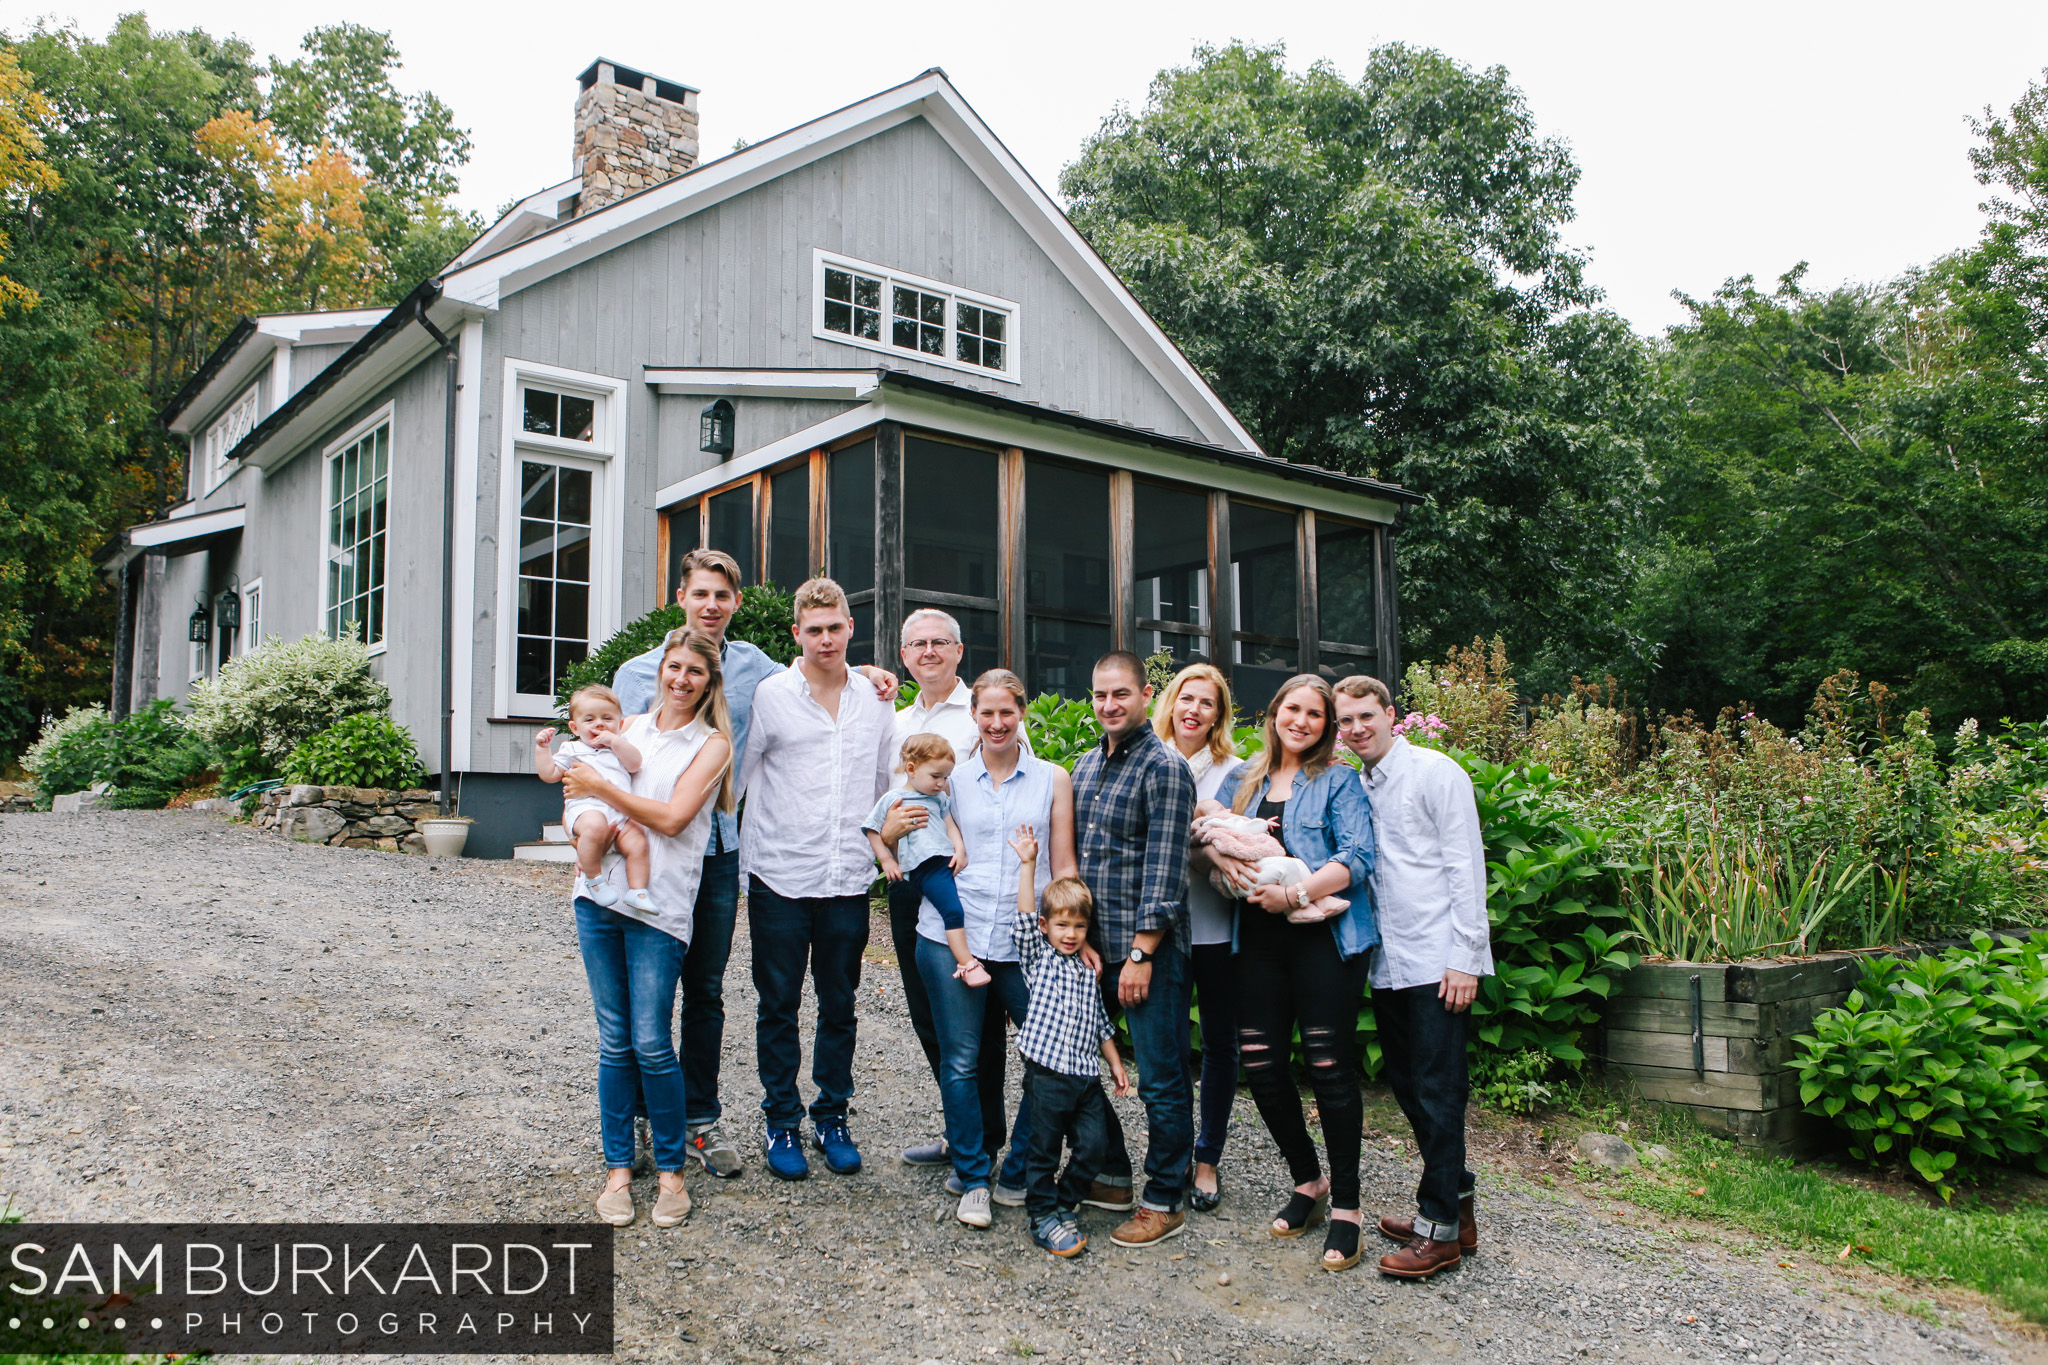 sburkardt_family_photos_fall_portraits_connecticut_washington_019.jpg